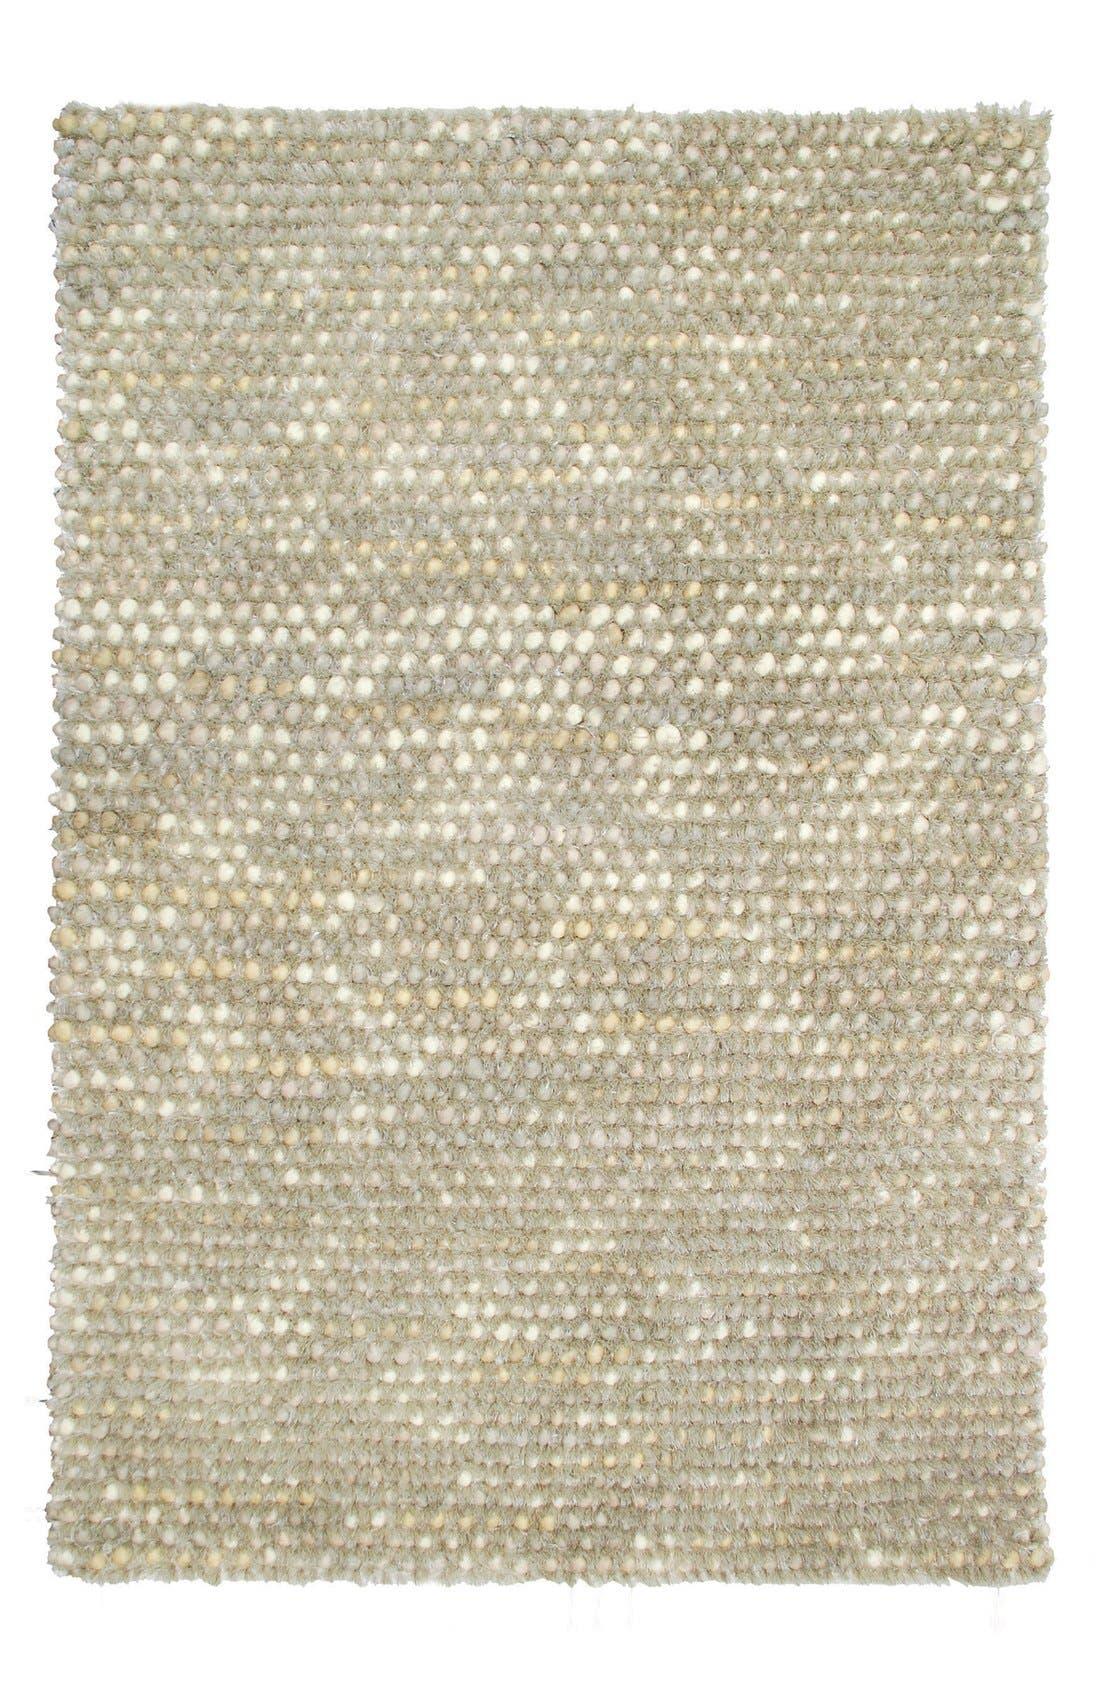 Main Image - Villa Home Collection Pebble Shag Rug